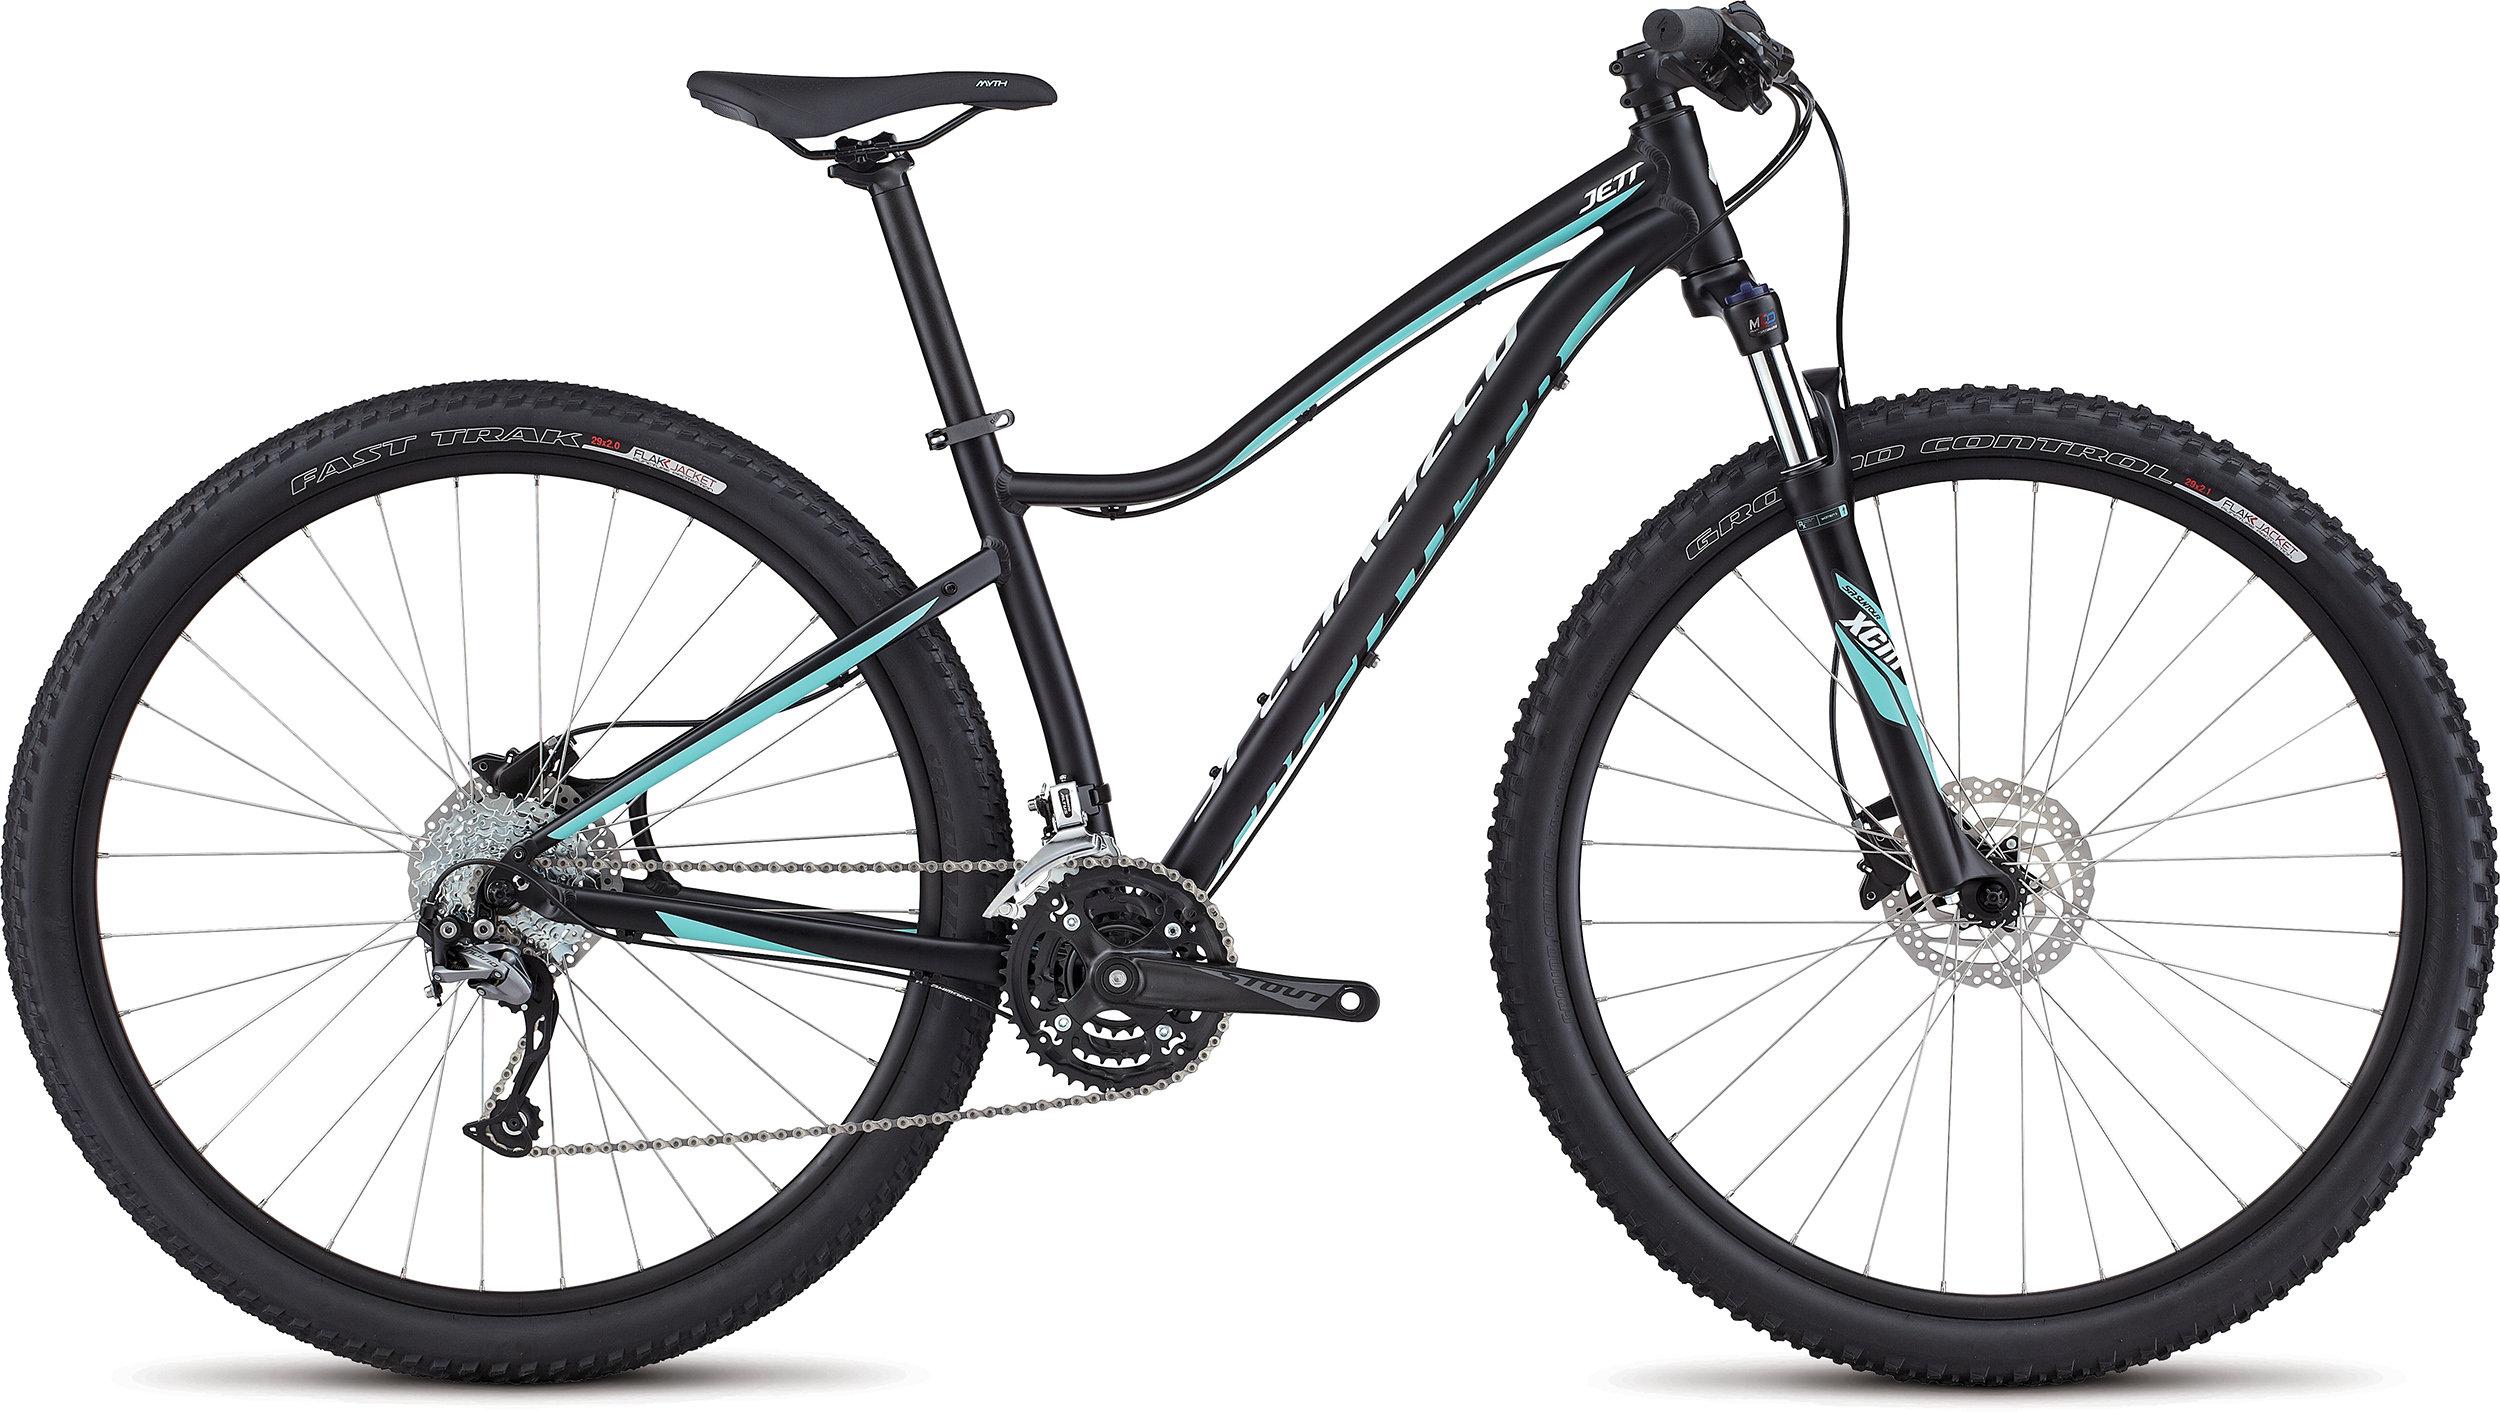 SPECIALIZED JETT SPORT 29 TARBLK/LTTUR/METWHTSIL S - Bike Maniac